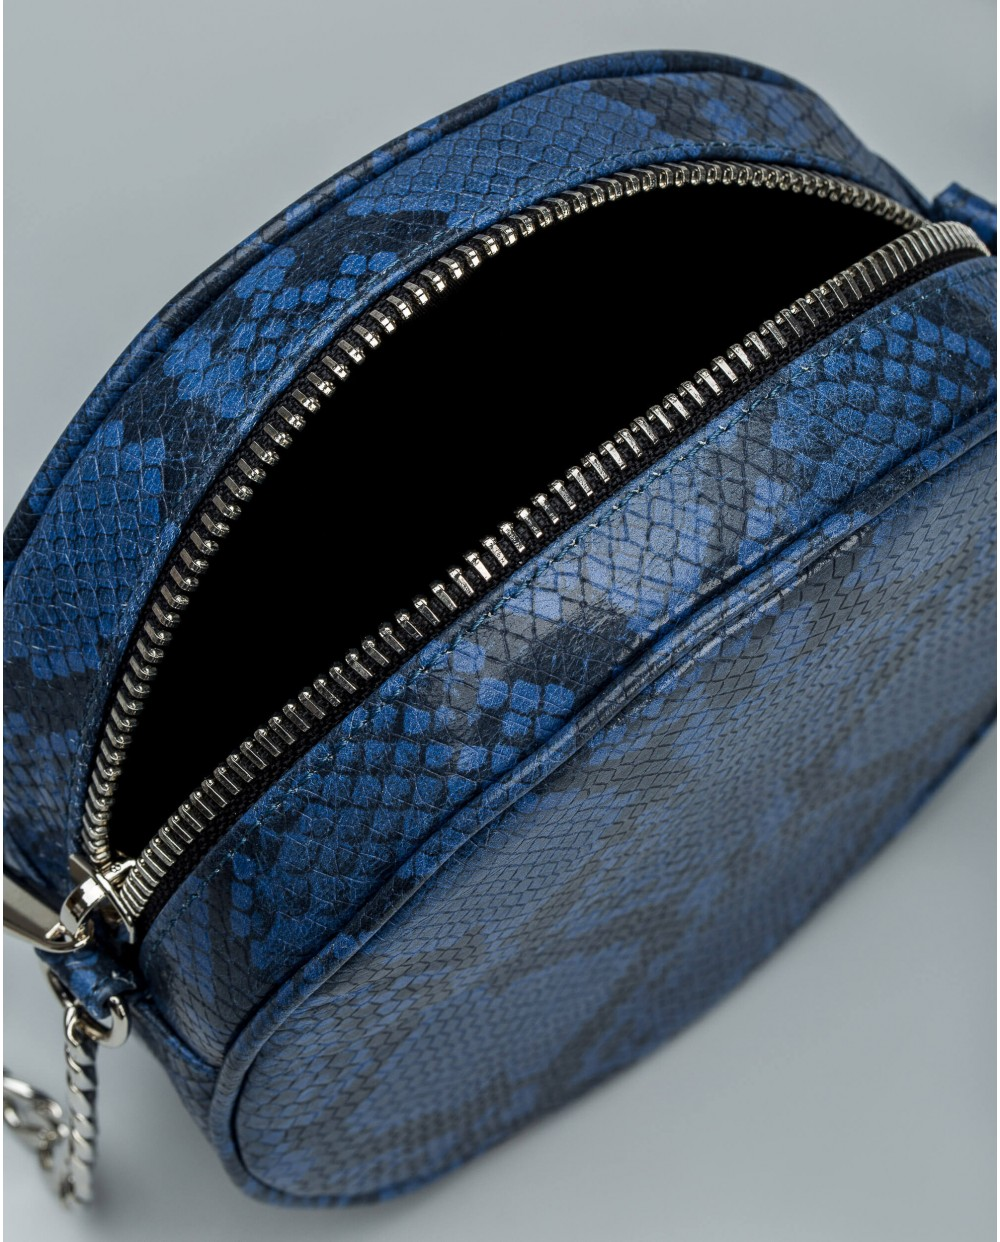 Circular handbag with crossbody strap